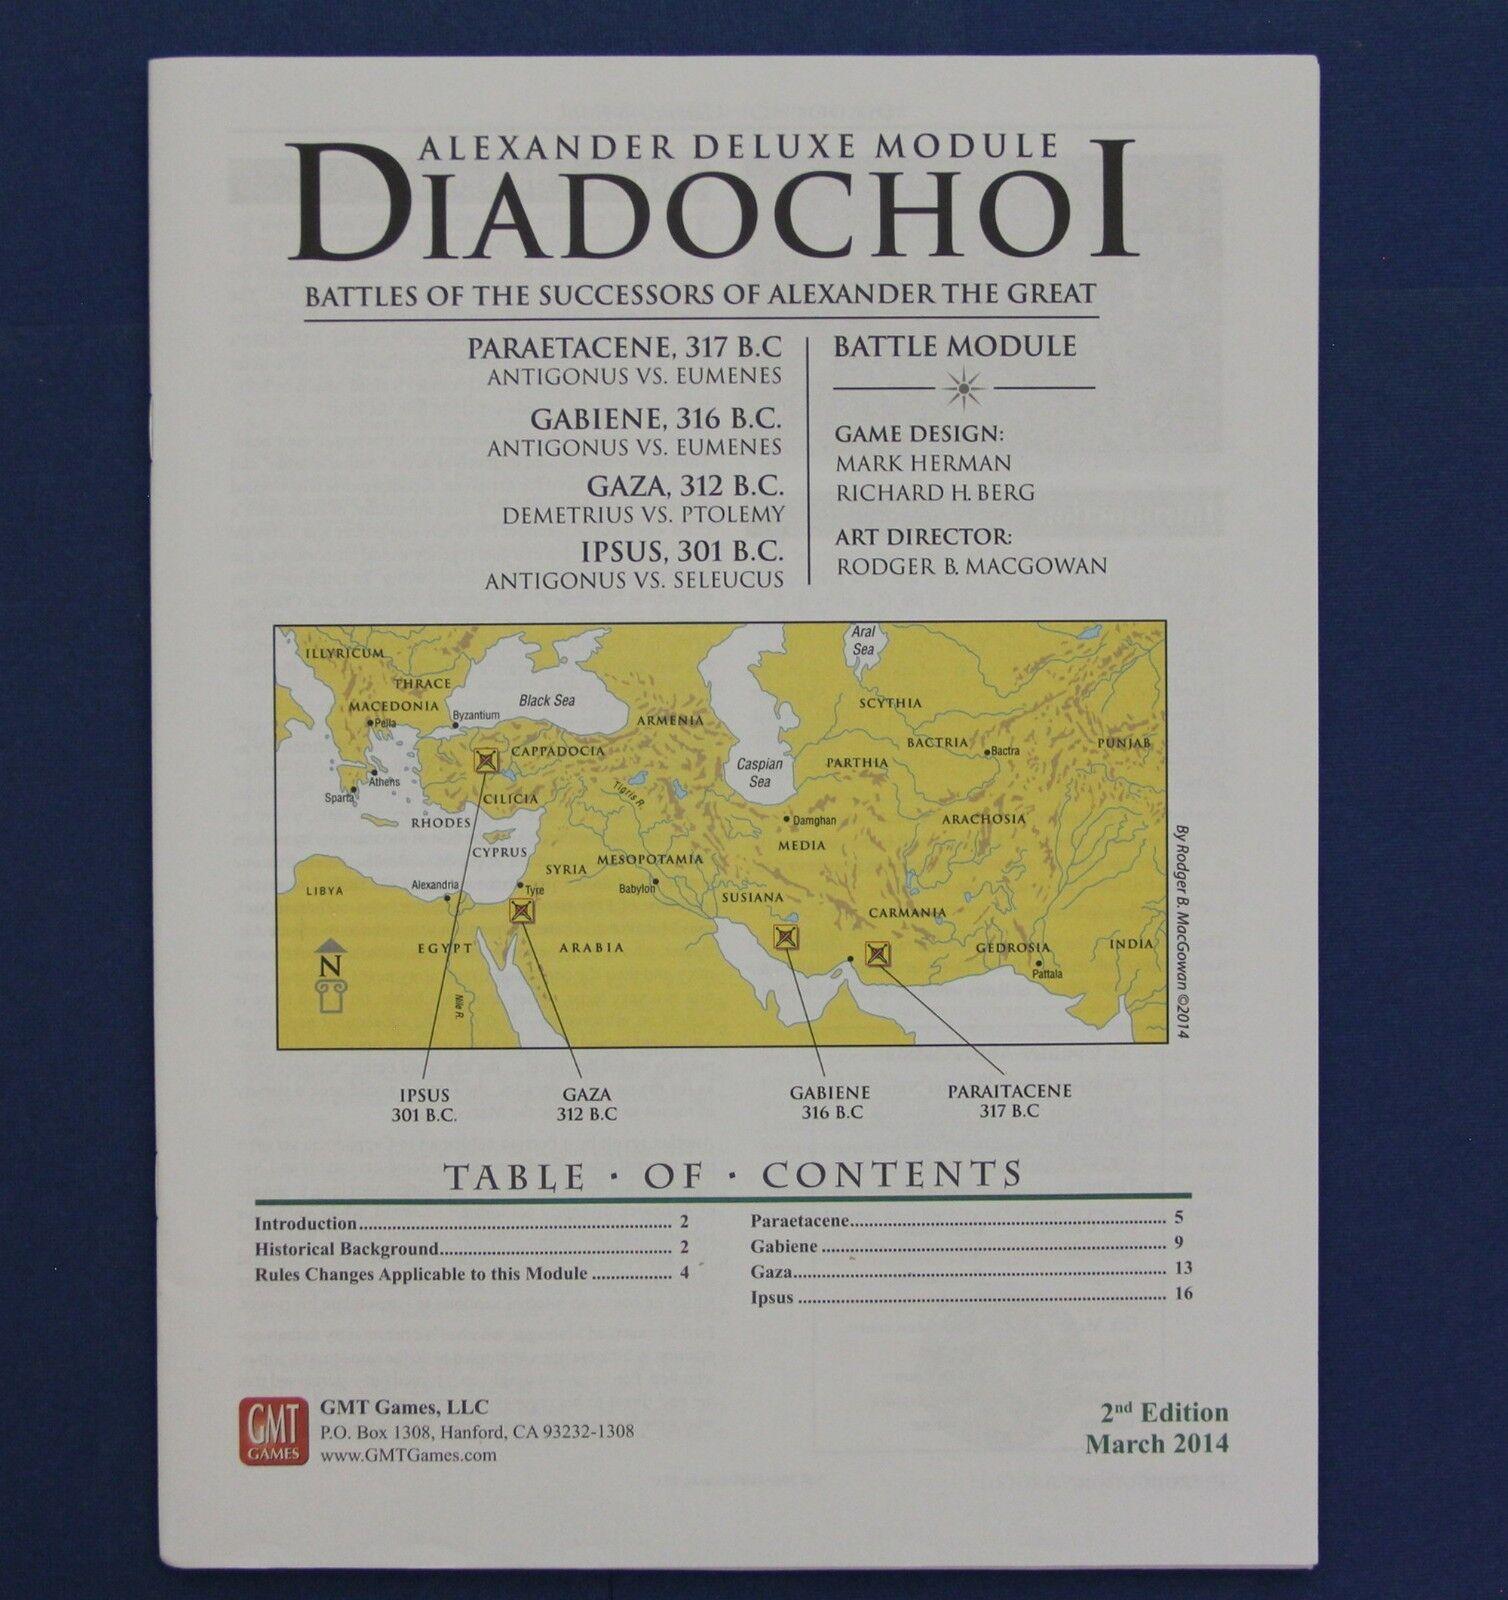 Great Battles of History Diadochoi Battles Alexander Deluxe Module 2d Edition